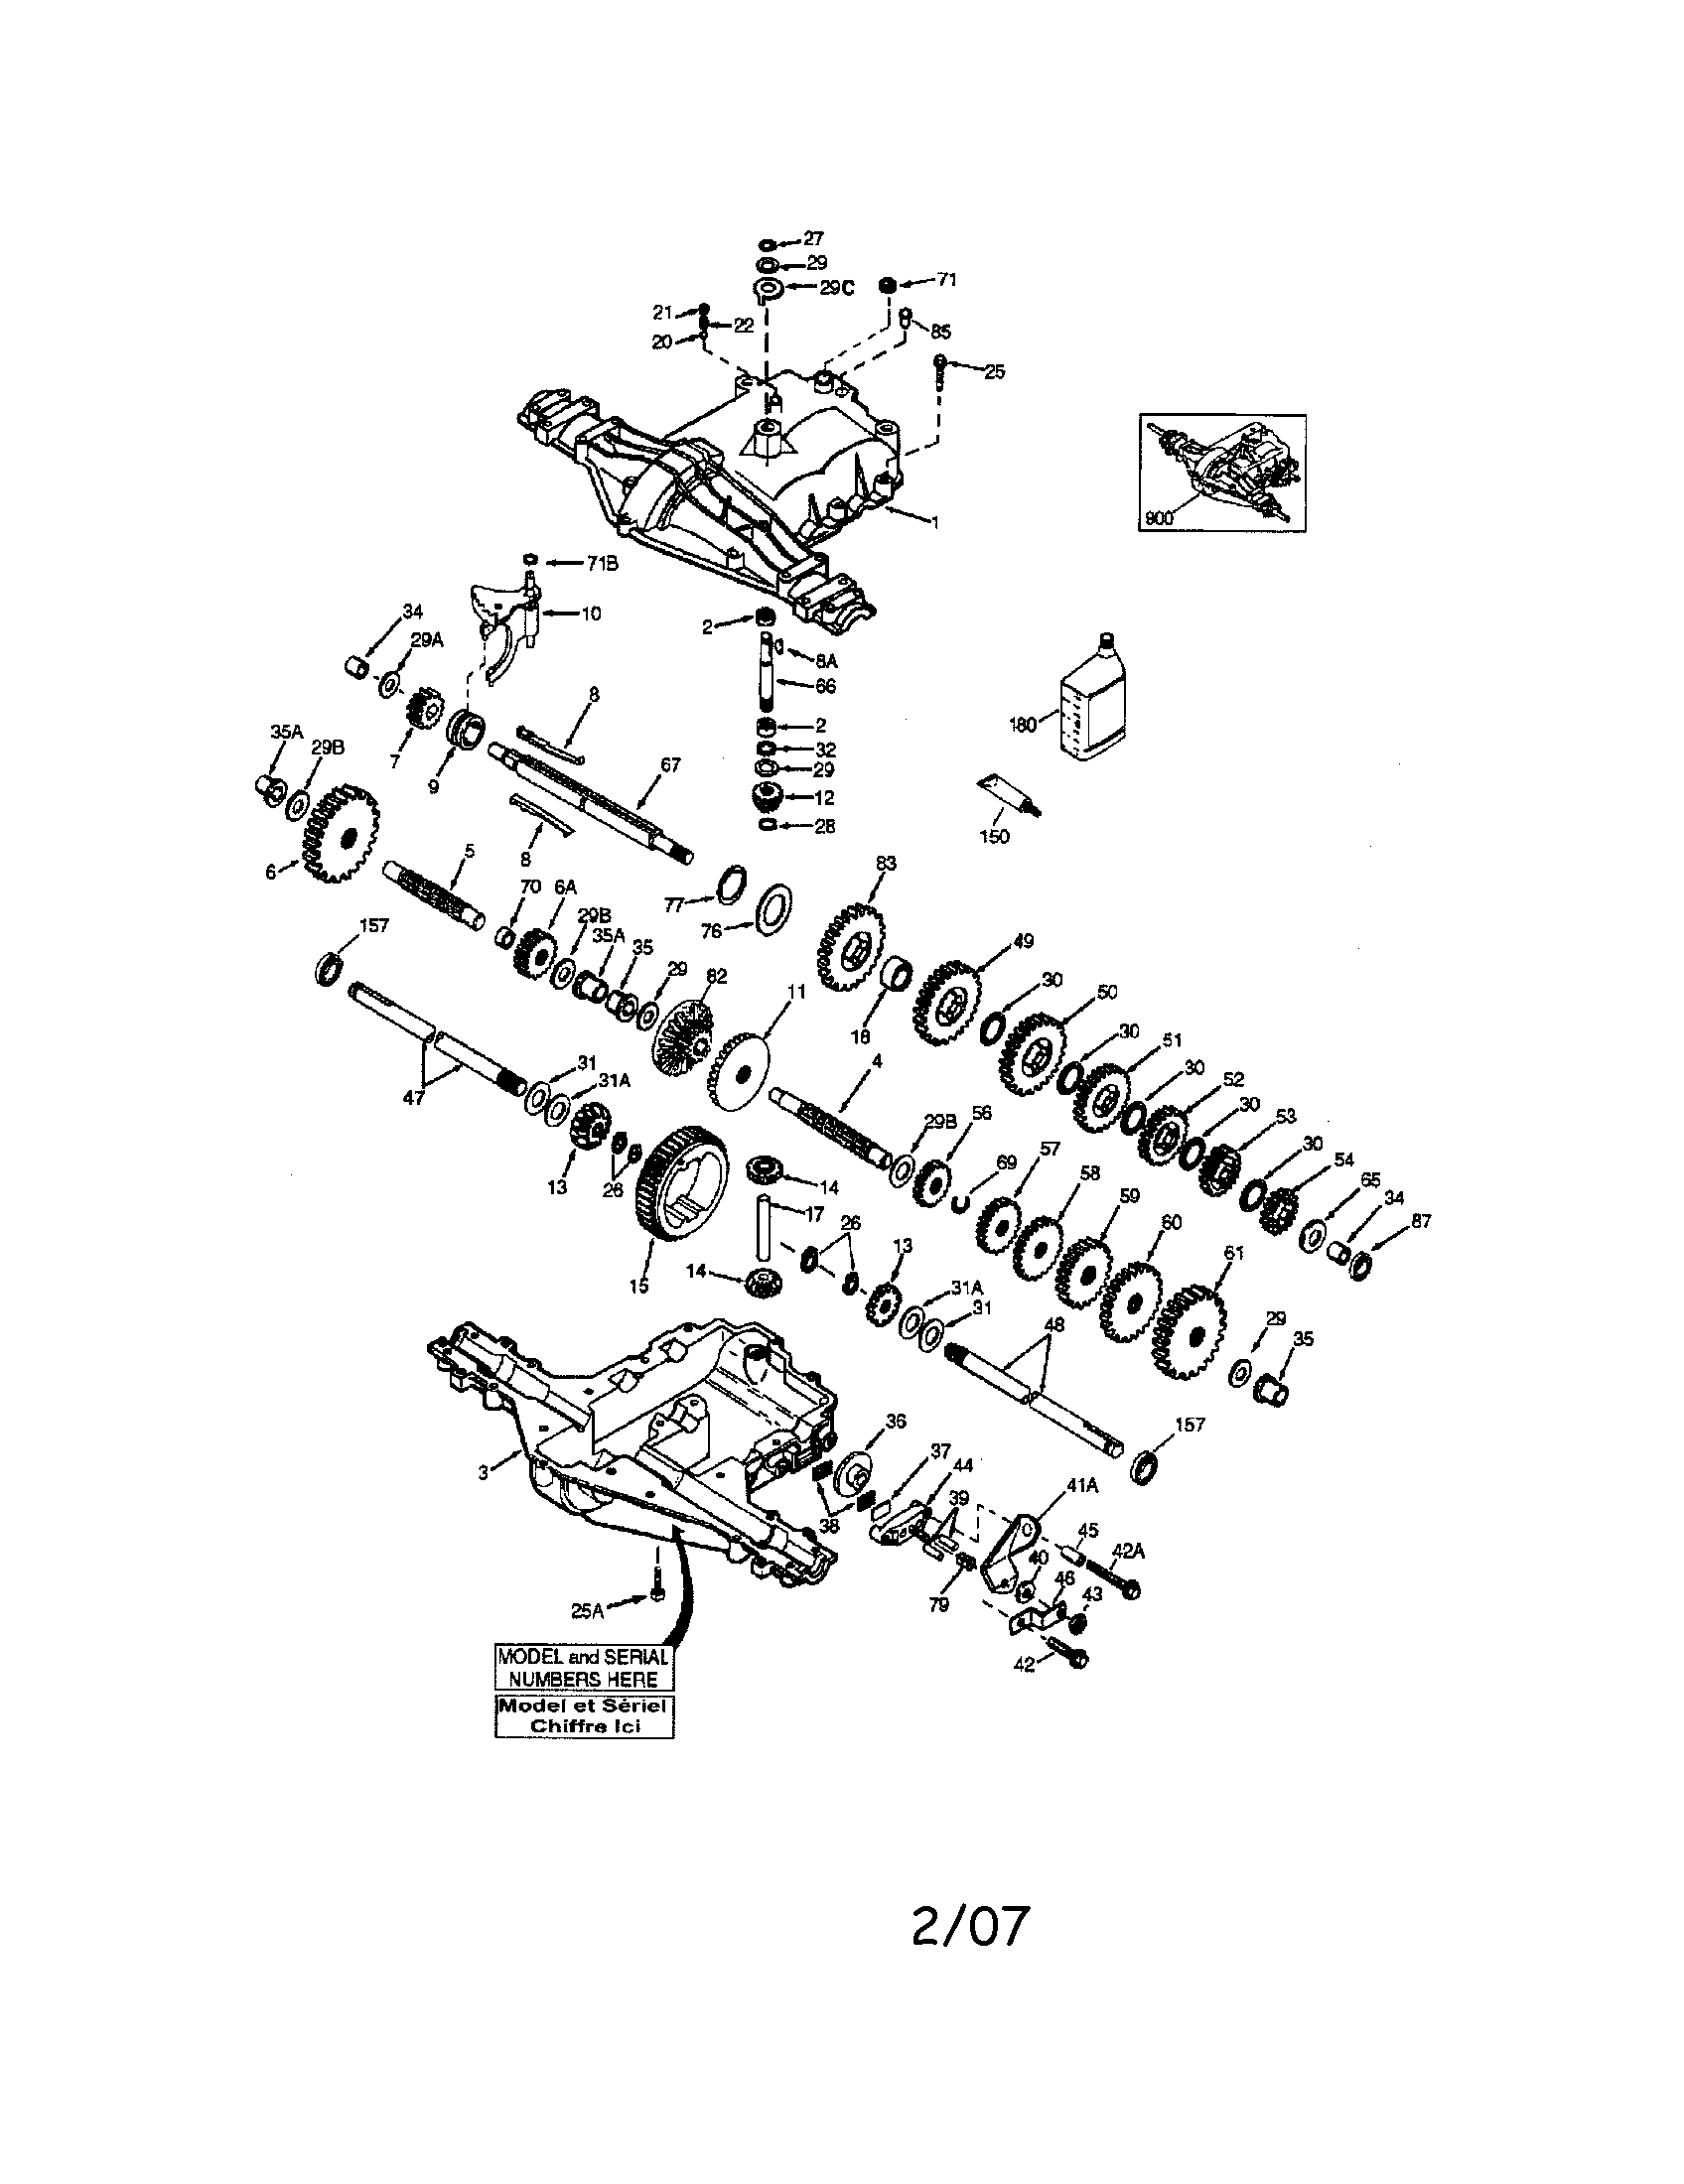 medium resolution of peerless transaxle diagram parts list for model 917270812 craftsman parts riding mower